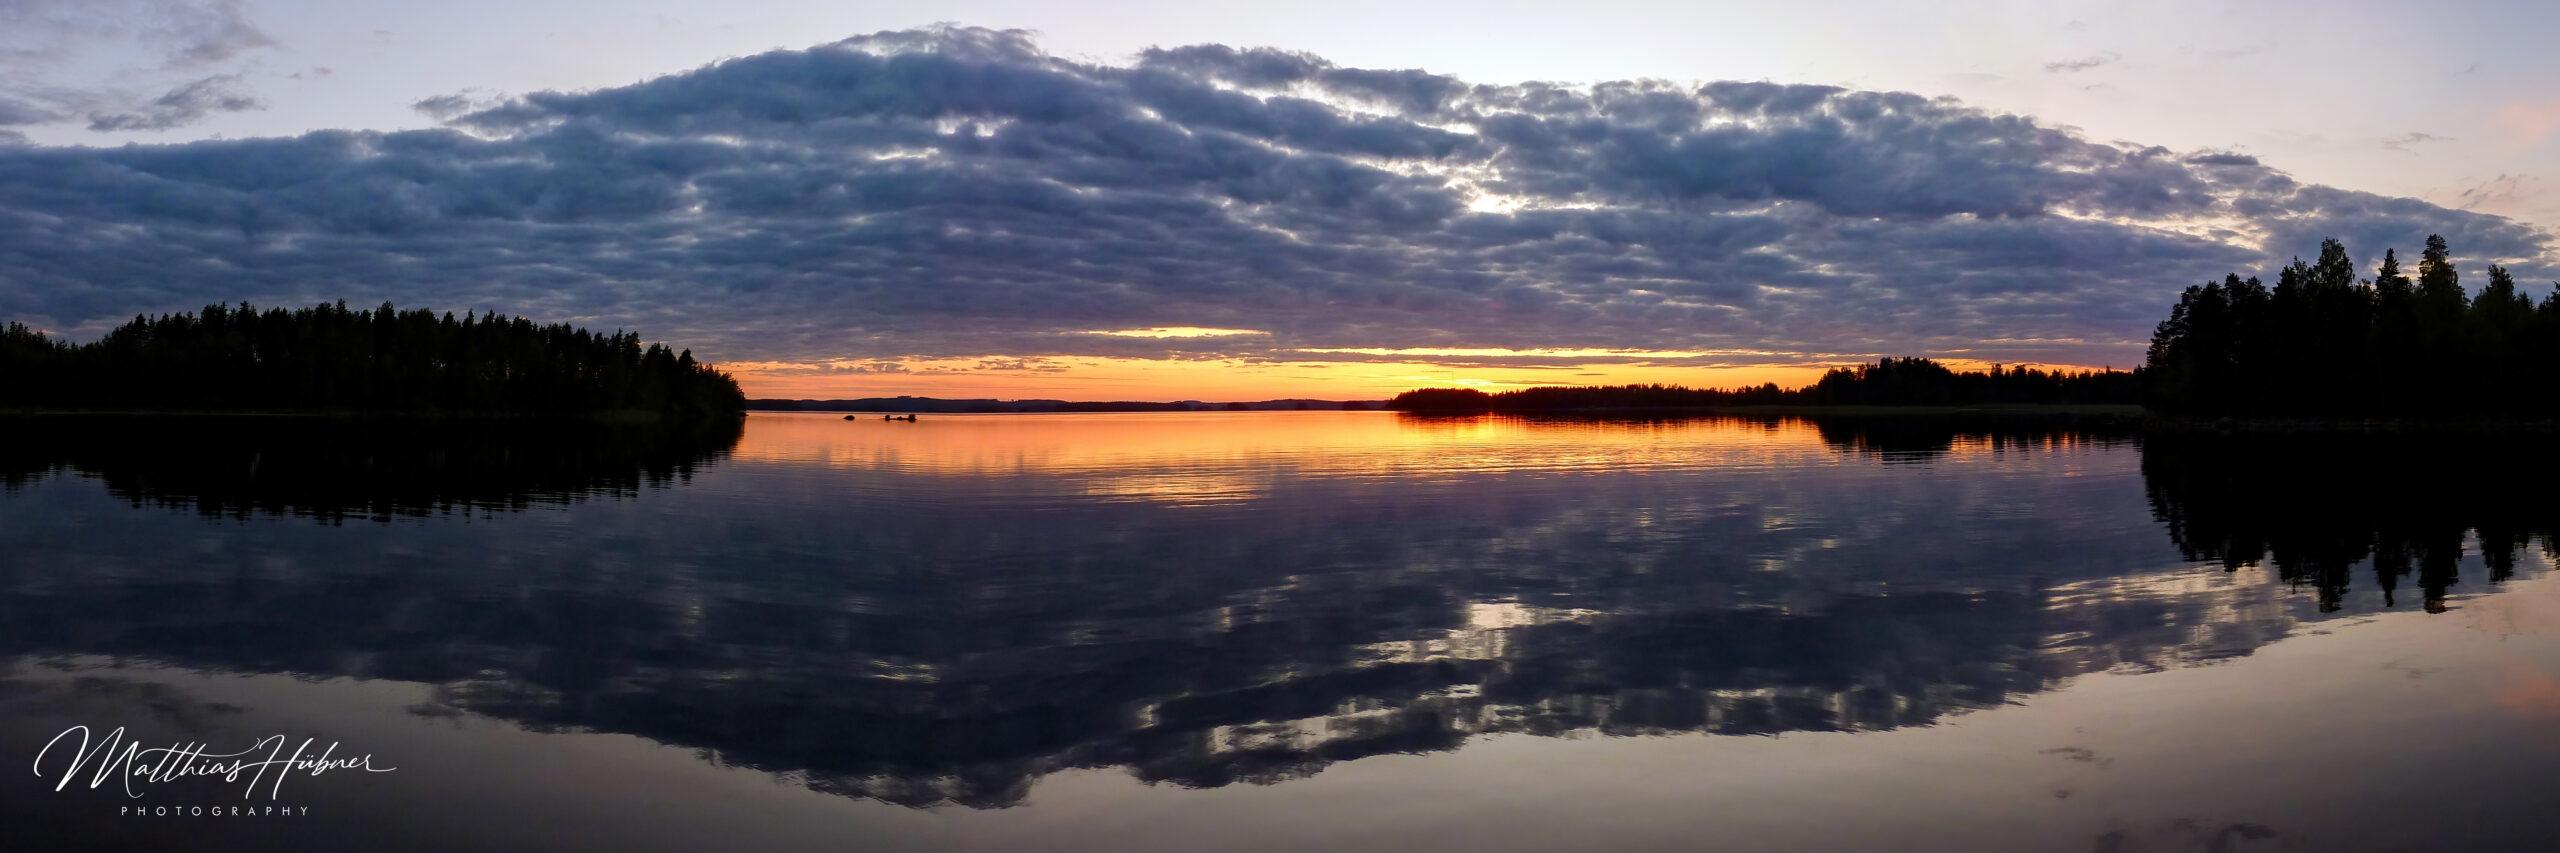 Sunset Hietavirta finland huebner photography